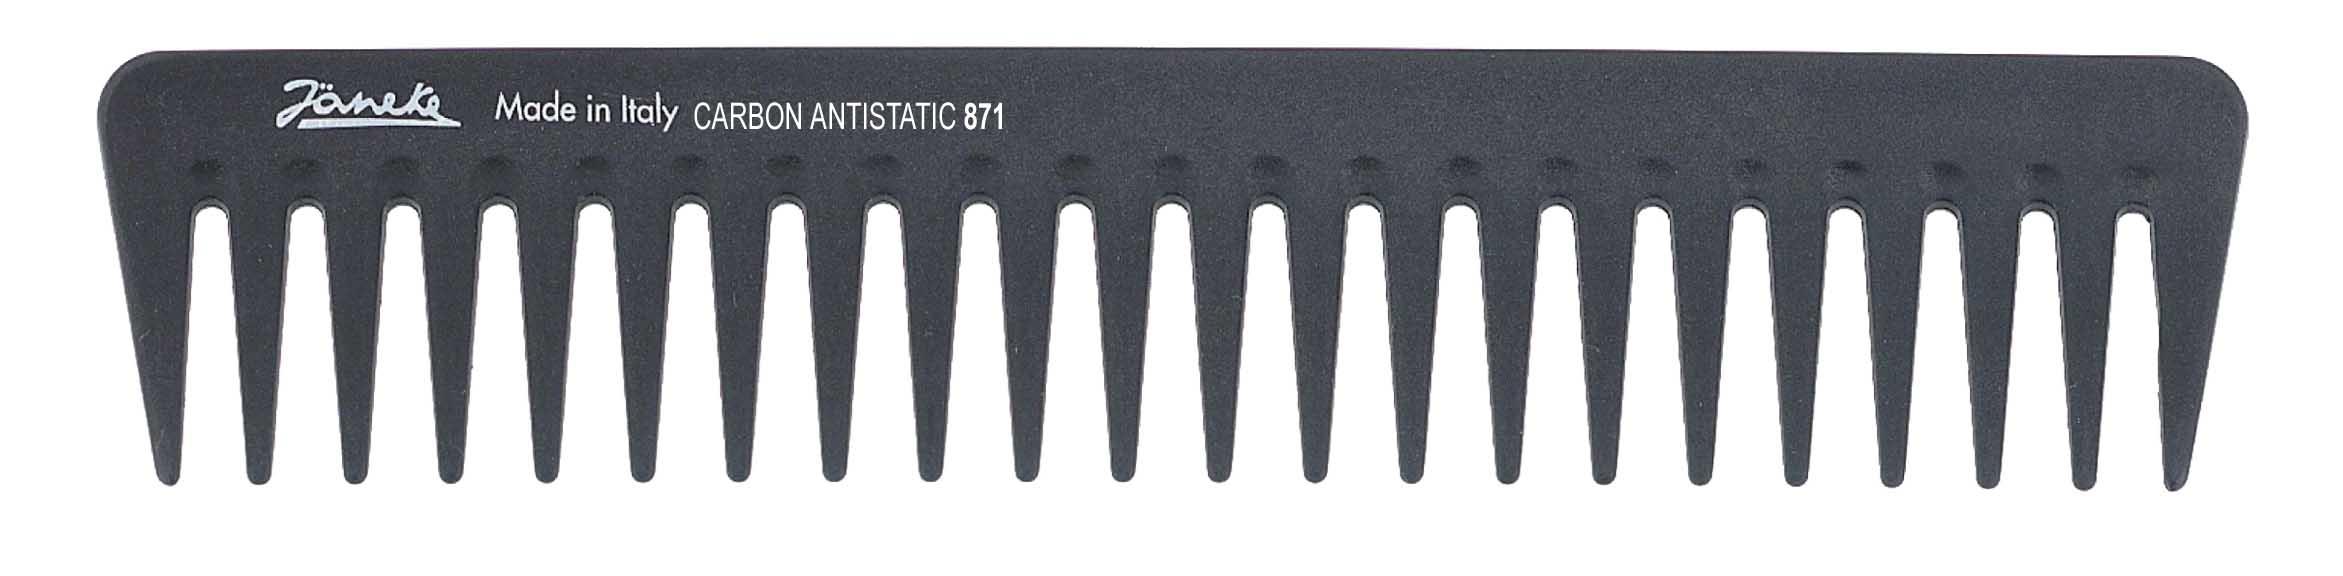 Gel application comb 19 cm Cod. 55871